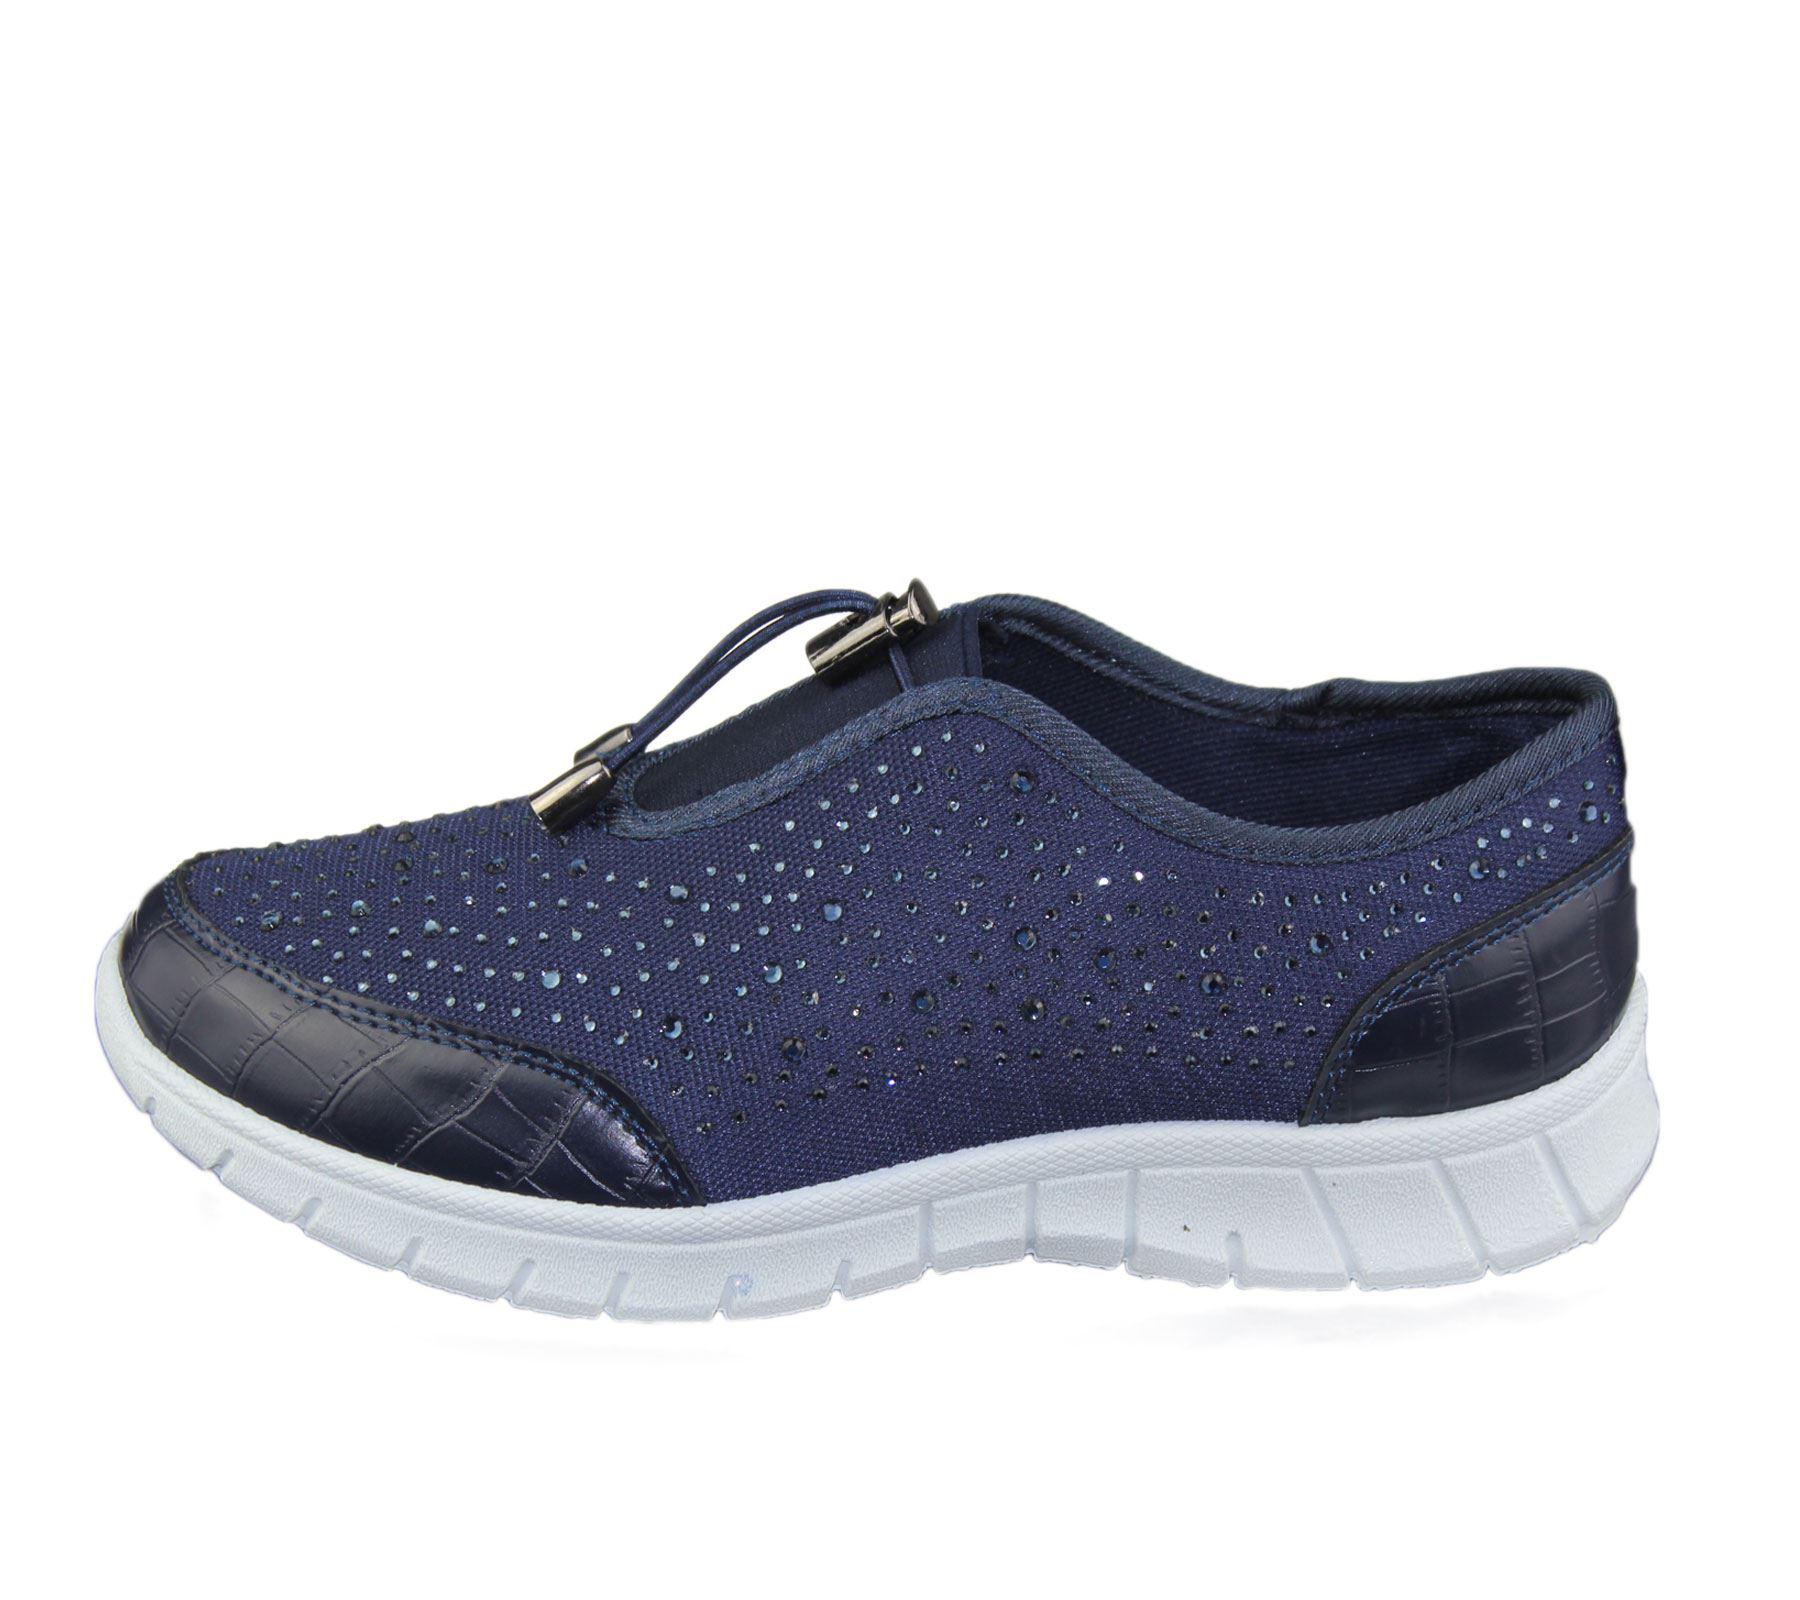 Womens-Trainer-Ladies-Comfort-Walking-Fashion-Summer-Gym-Sport-Flat-Shoes-Size thumbnail 13